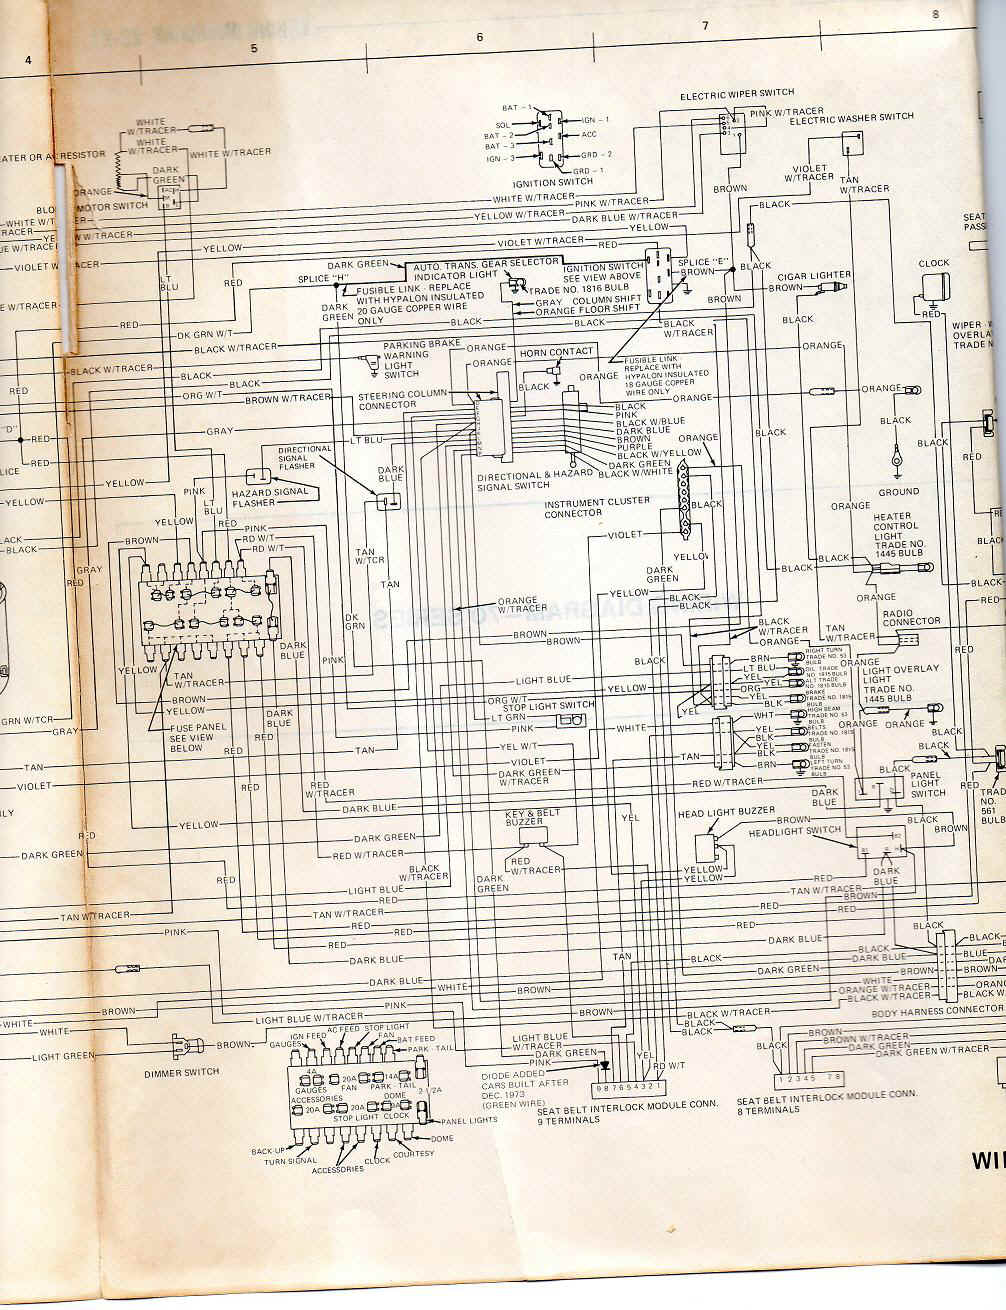 1969 amx wiring diagram